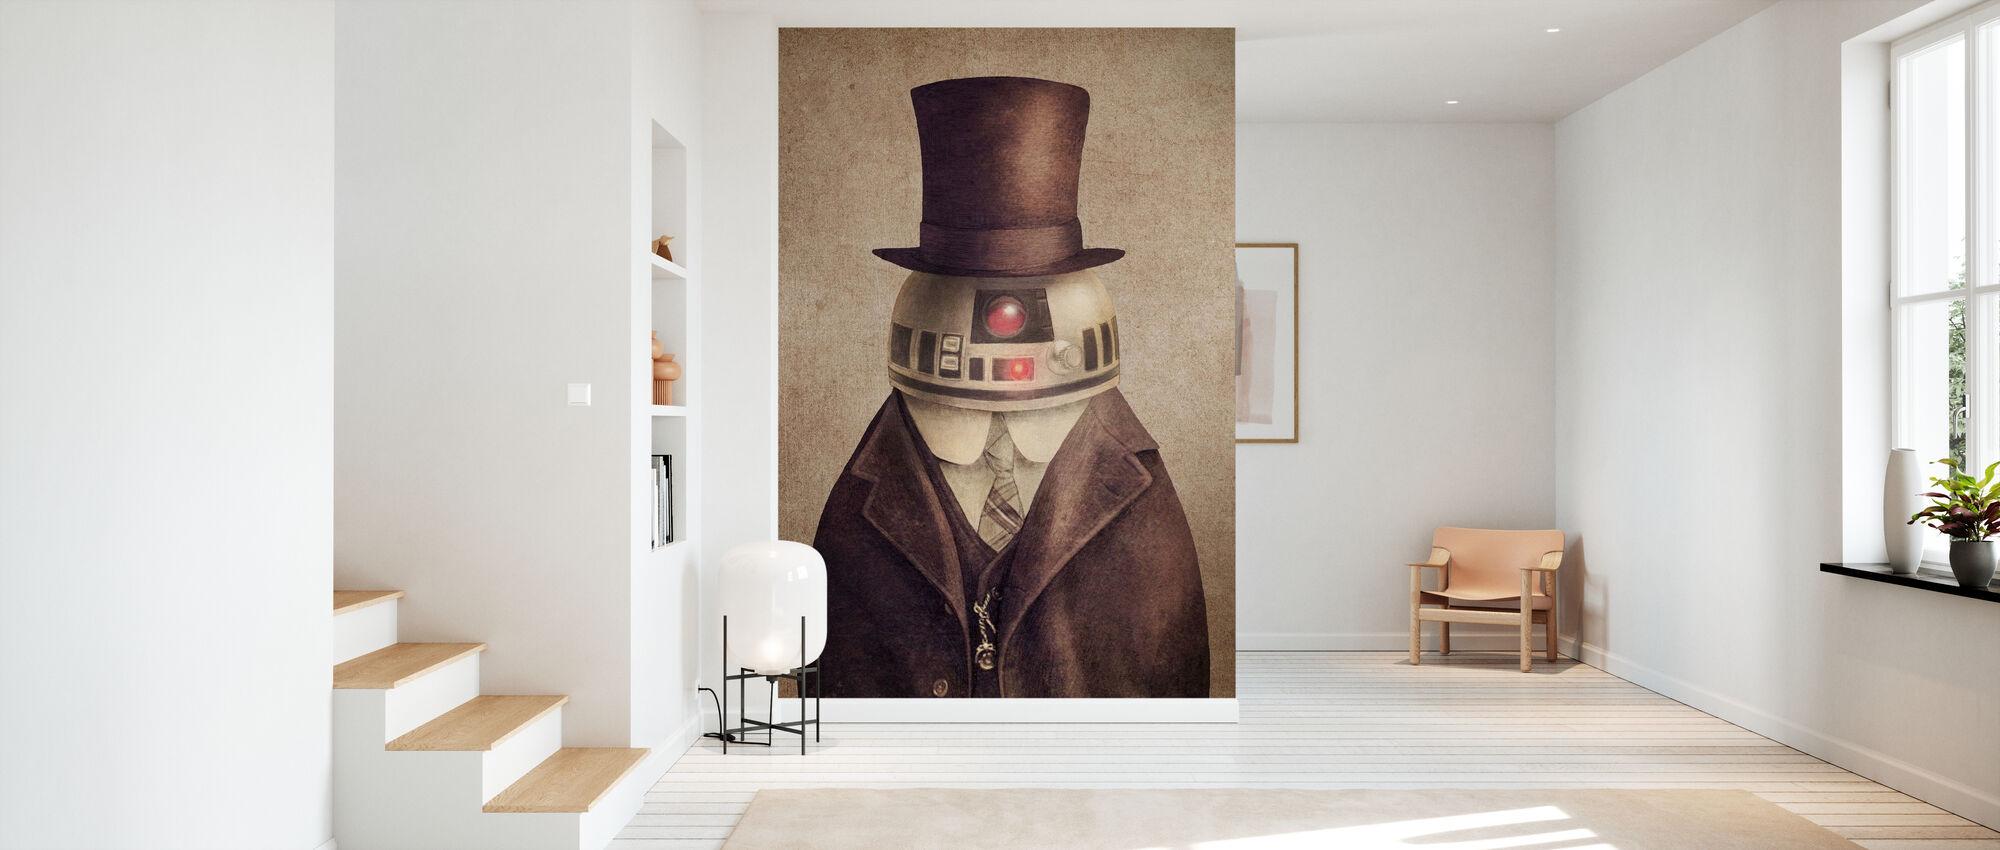 Victorian Wars Duke R2 - Papel pintado - Corredor